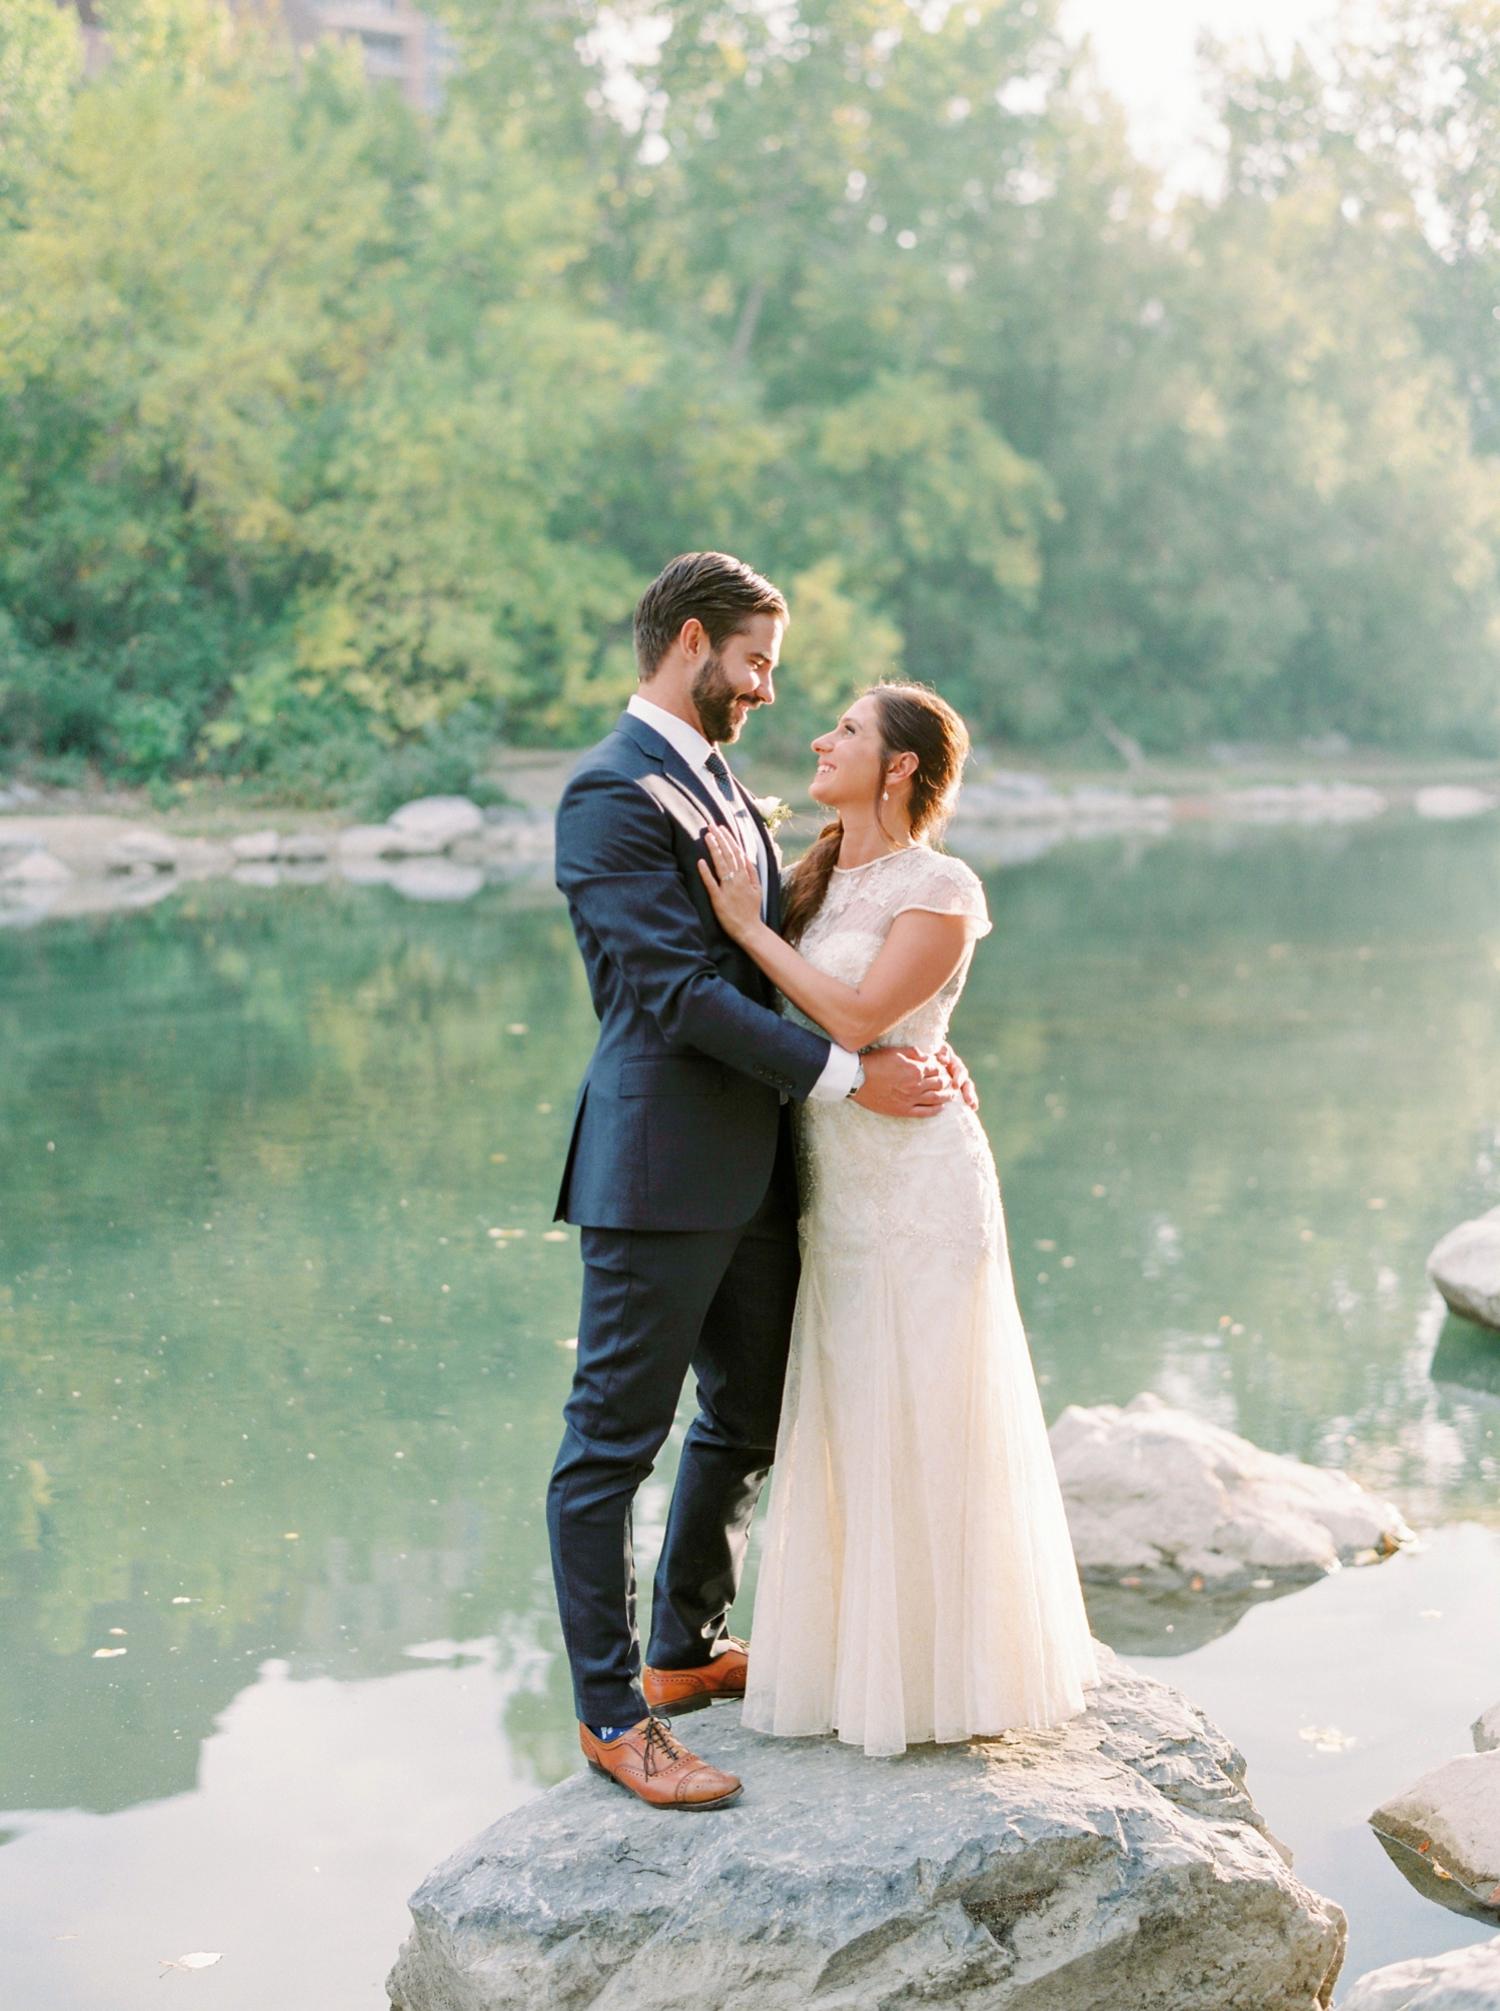 Calgary wedding photographers | fine art film | Justine Milton Photography | wedding inspiration | wedding dress | bride and groom portraits | river